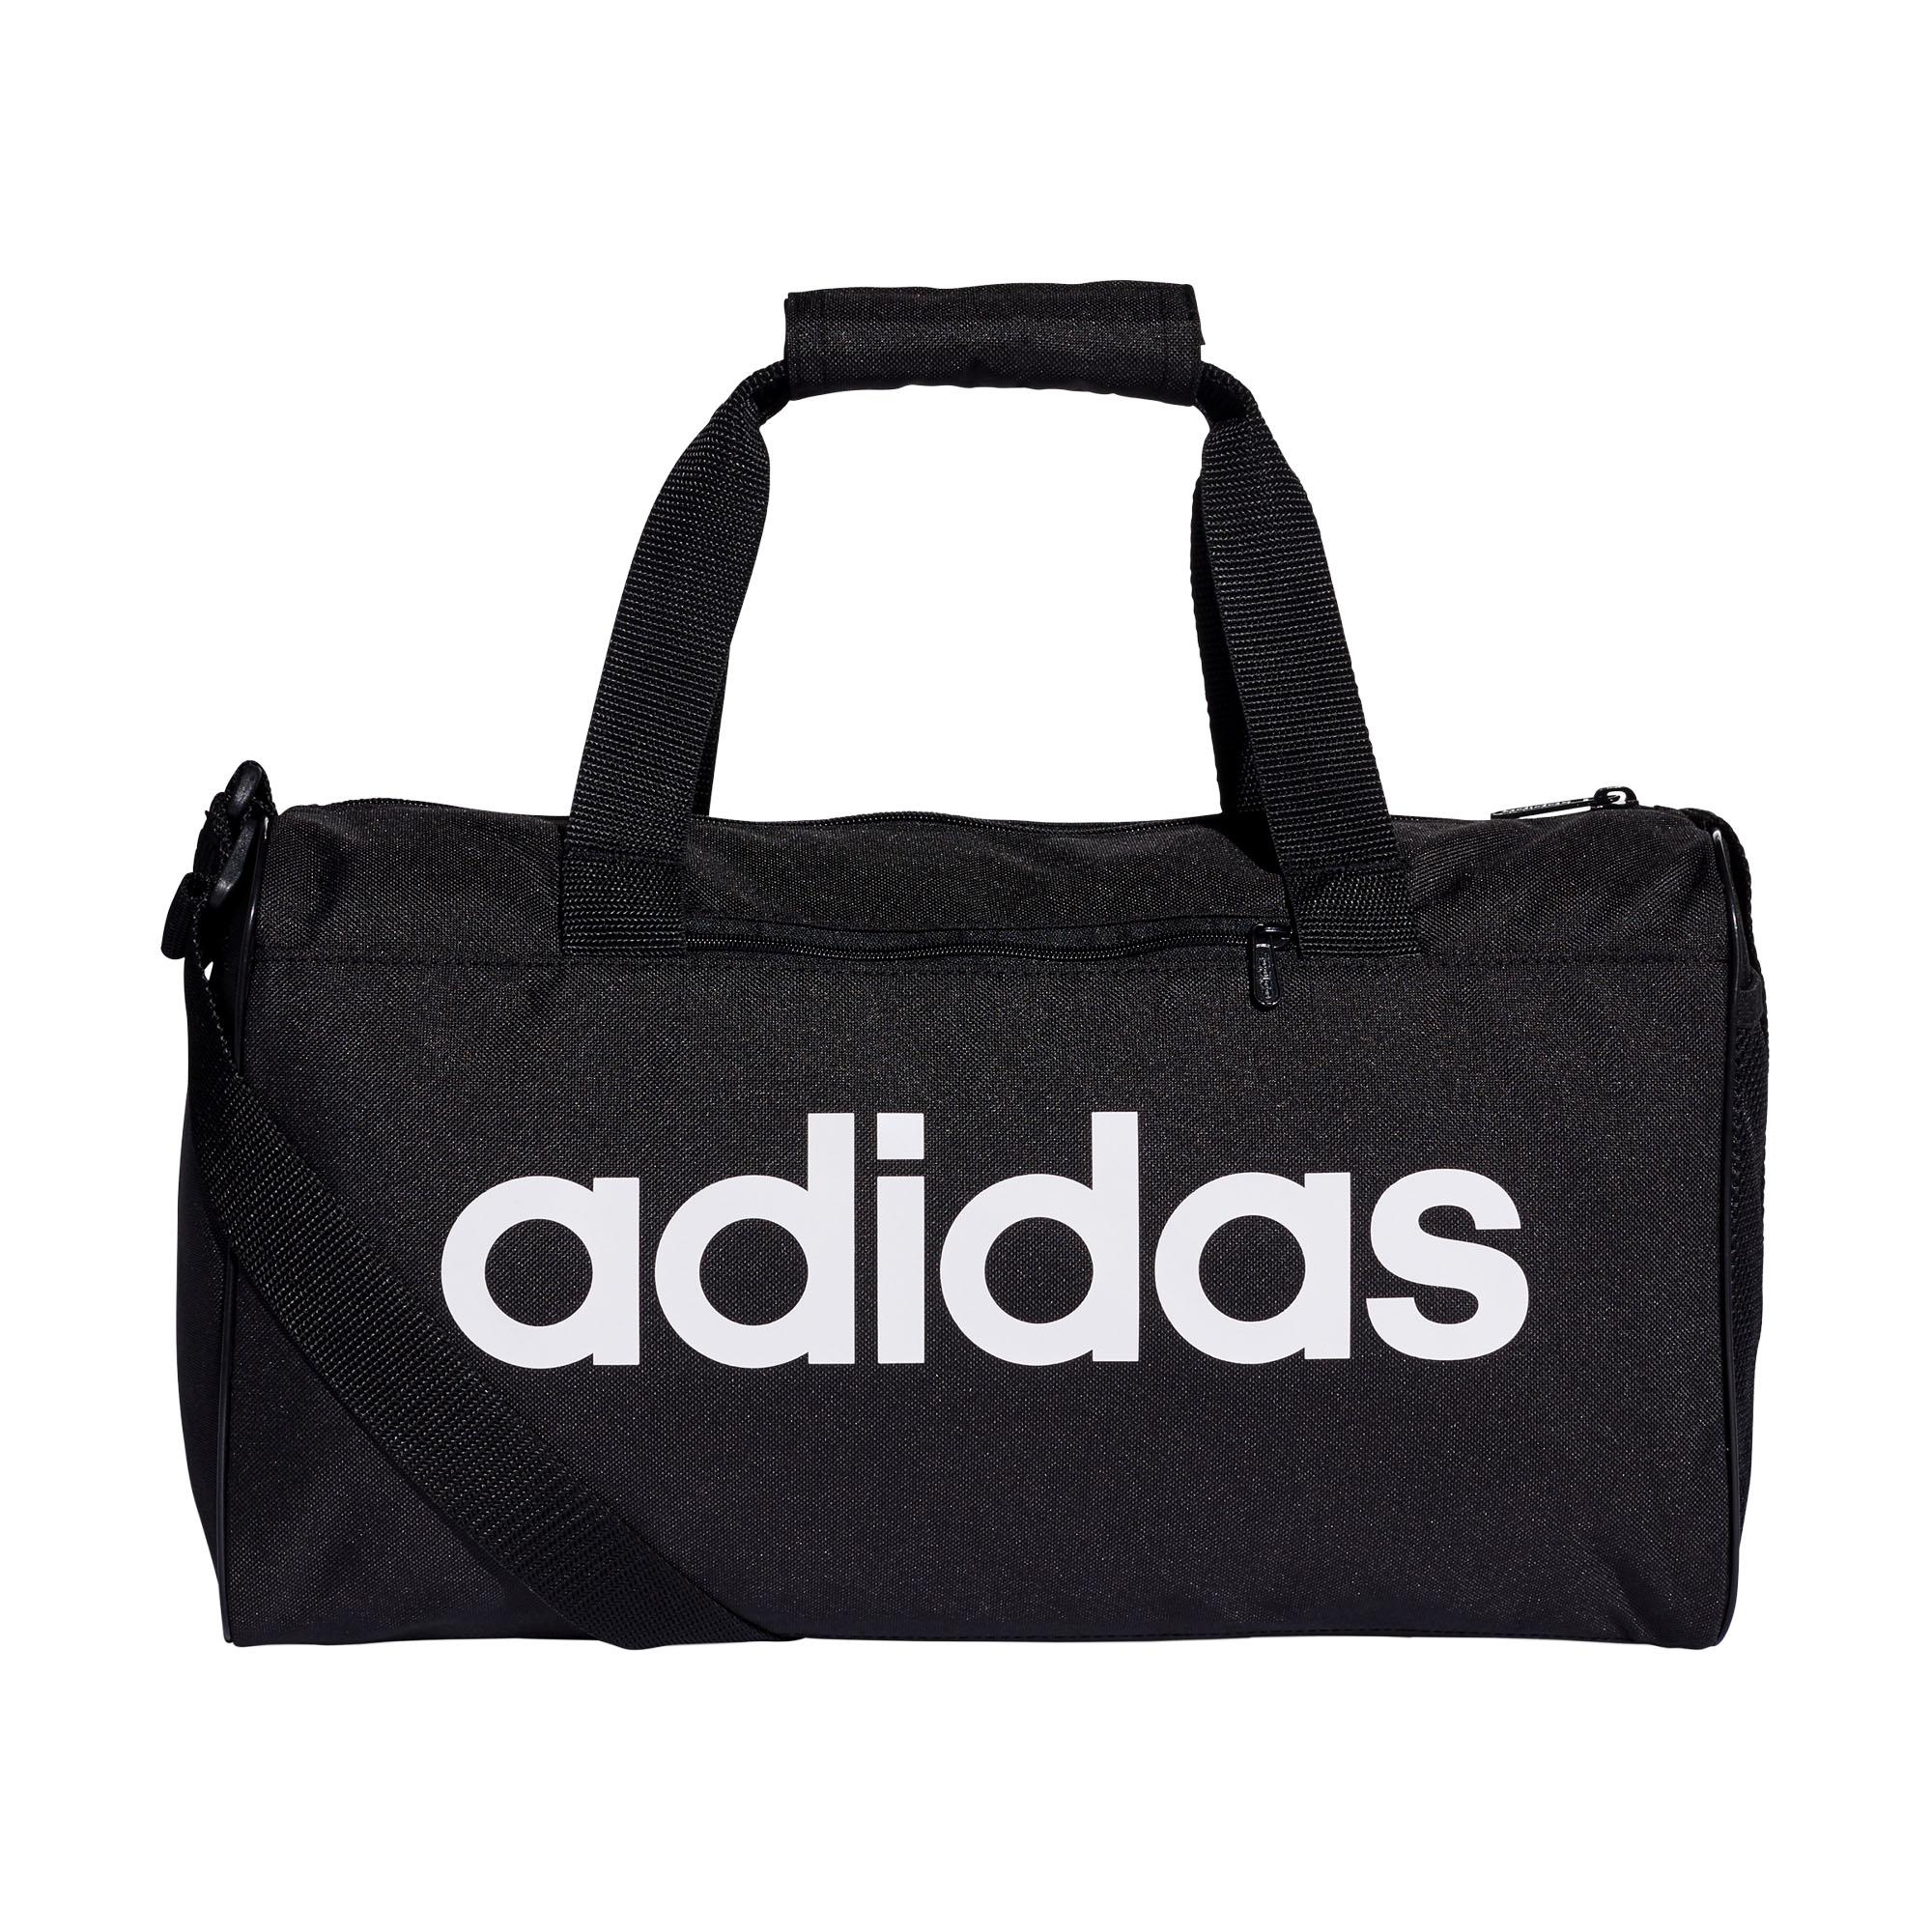 Details about adidas Linear Core Team Duffel Holdall Training Bag (XS) Black  White 1348dde0fb24e